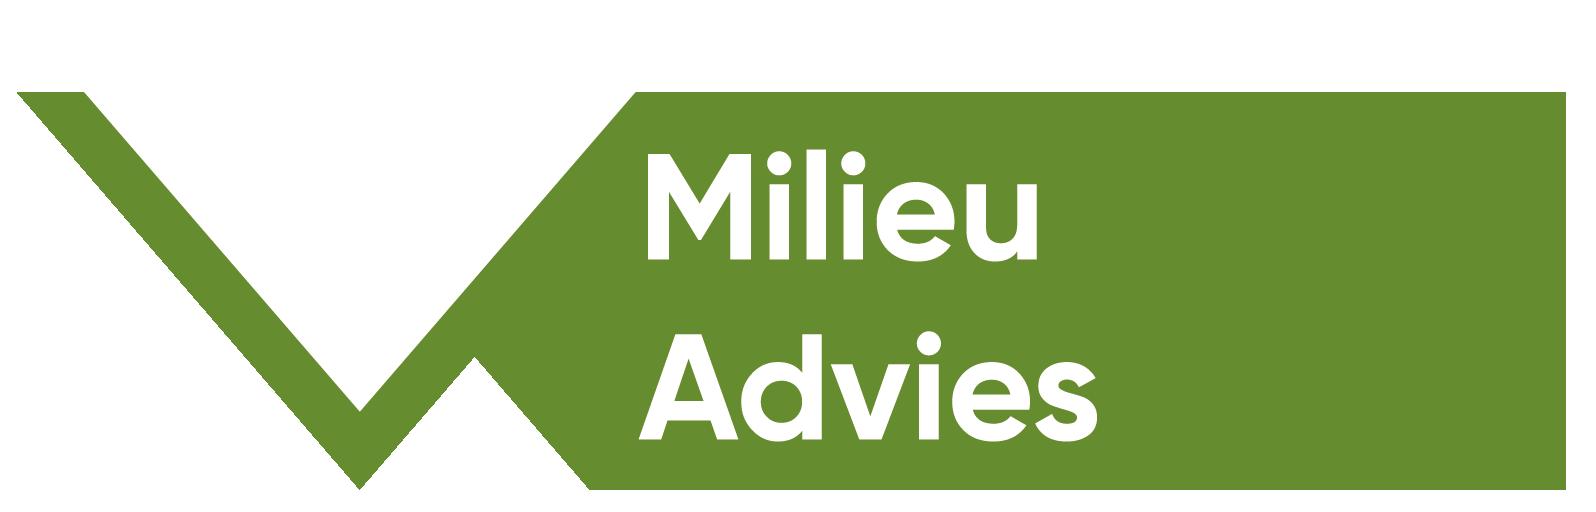 Milieu-Advies-button